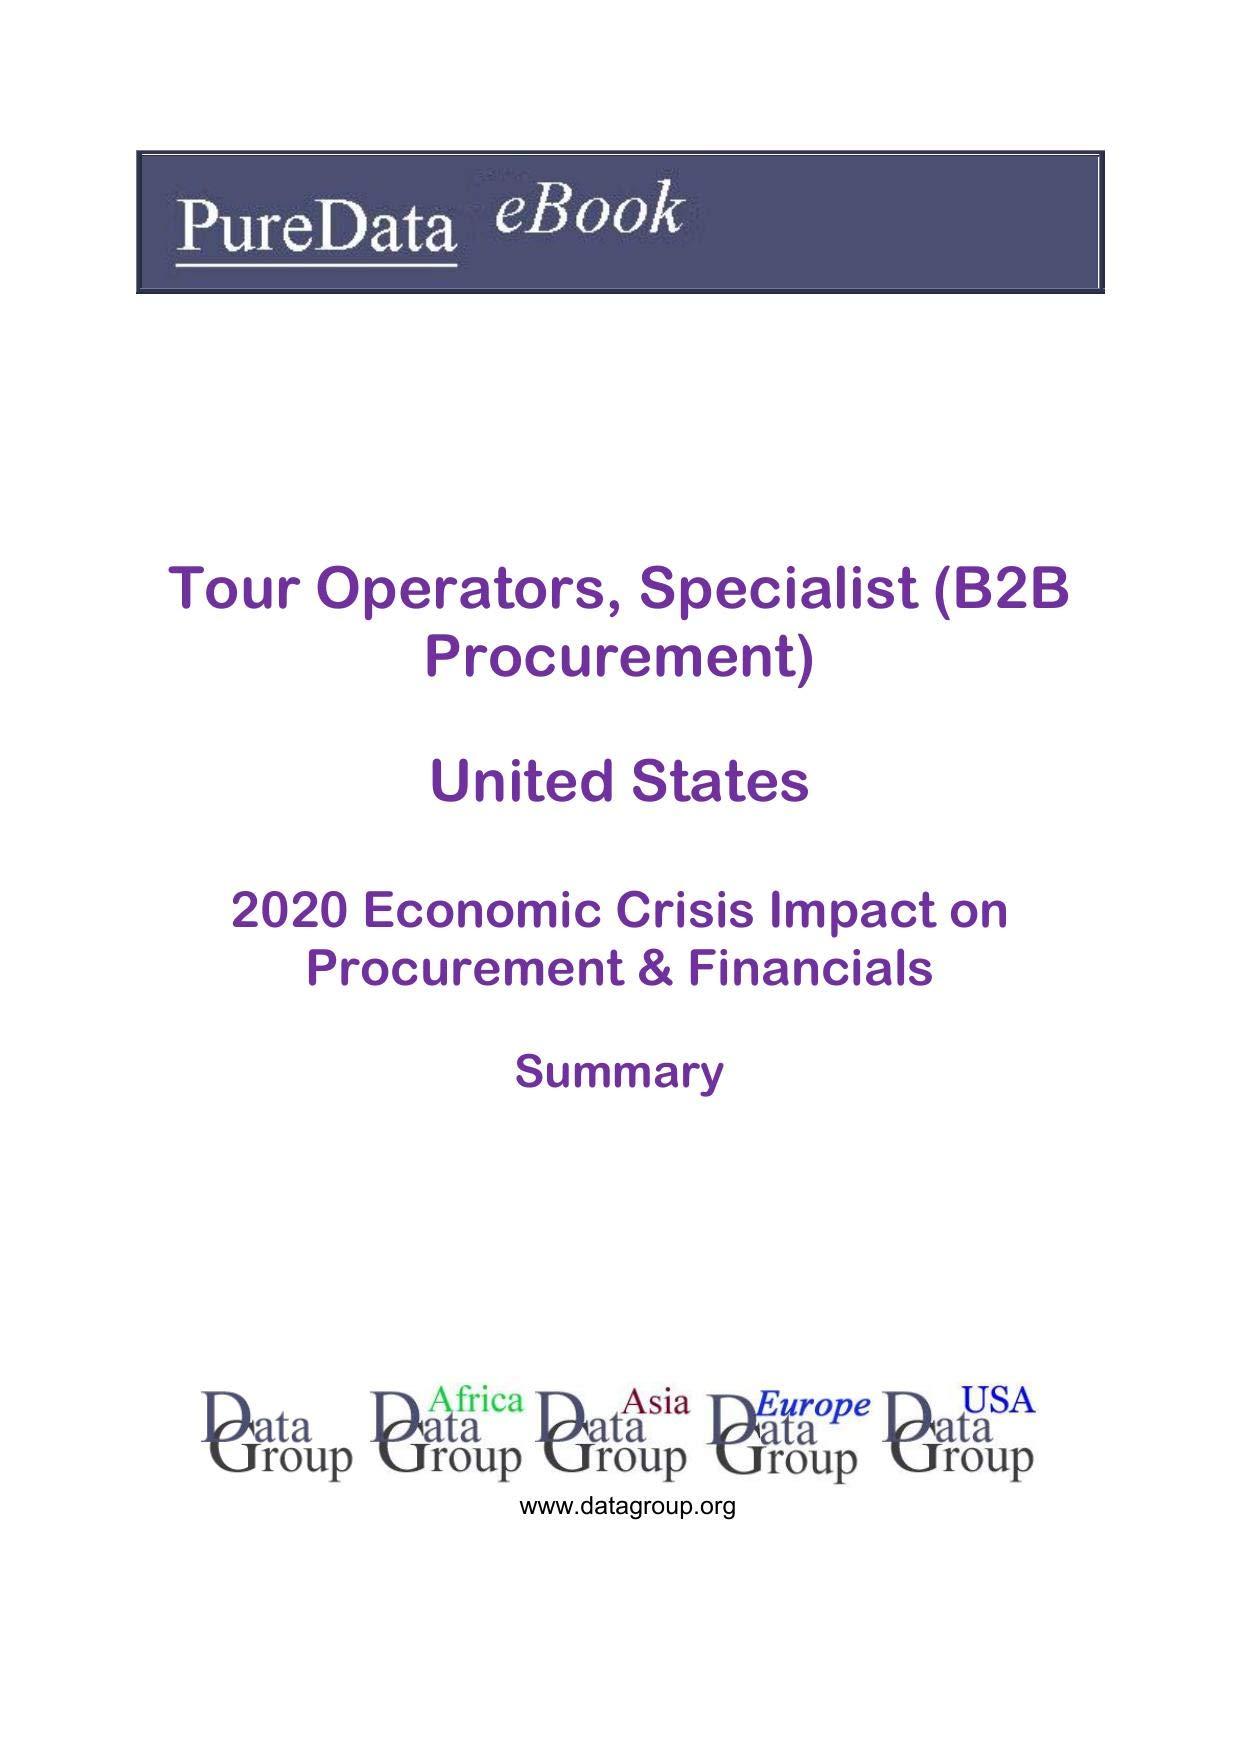 Tour Operators, Specialist (B2B Procurement) United States Summary: 2020 Economic Crisis Impact on Revenues & Financials